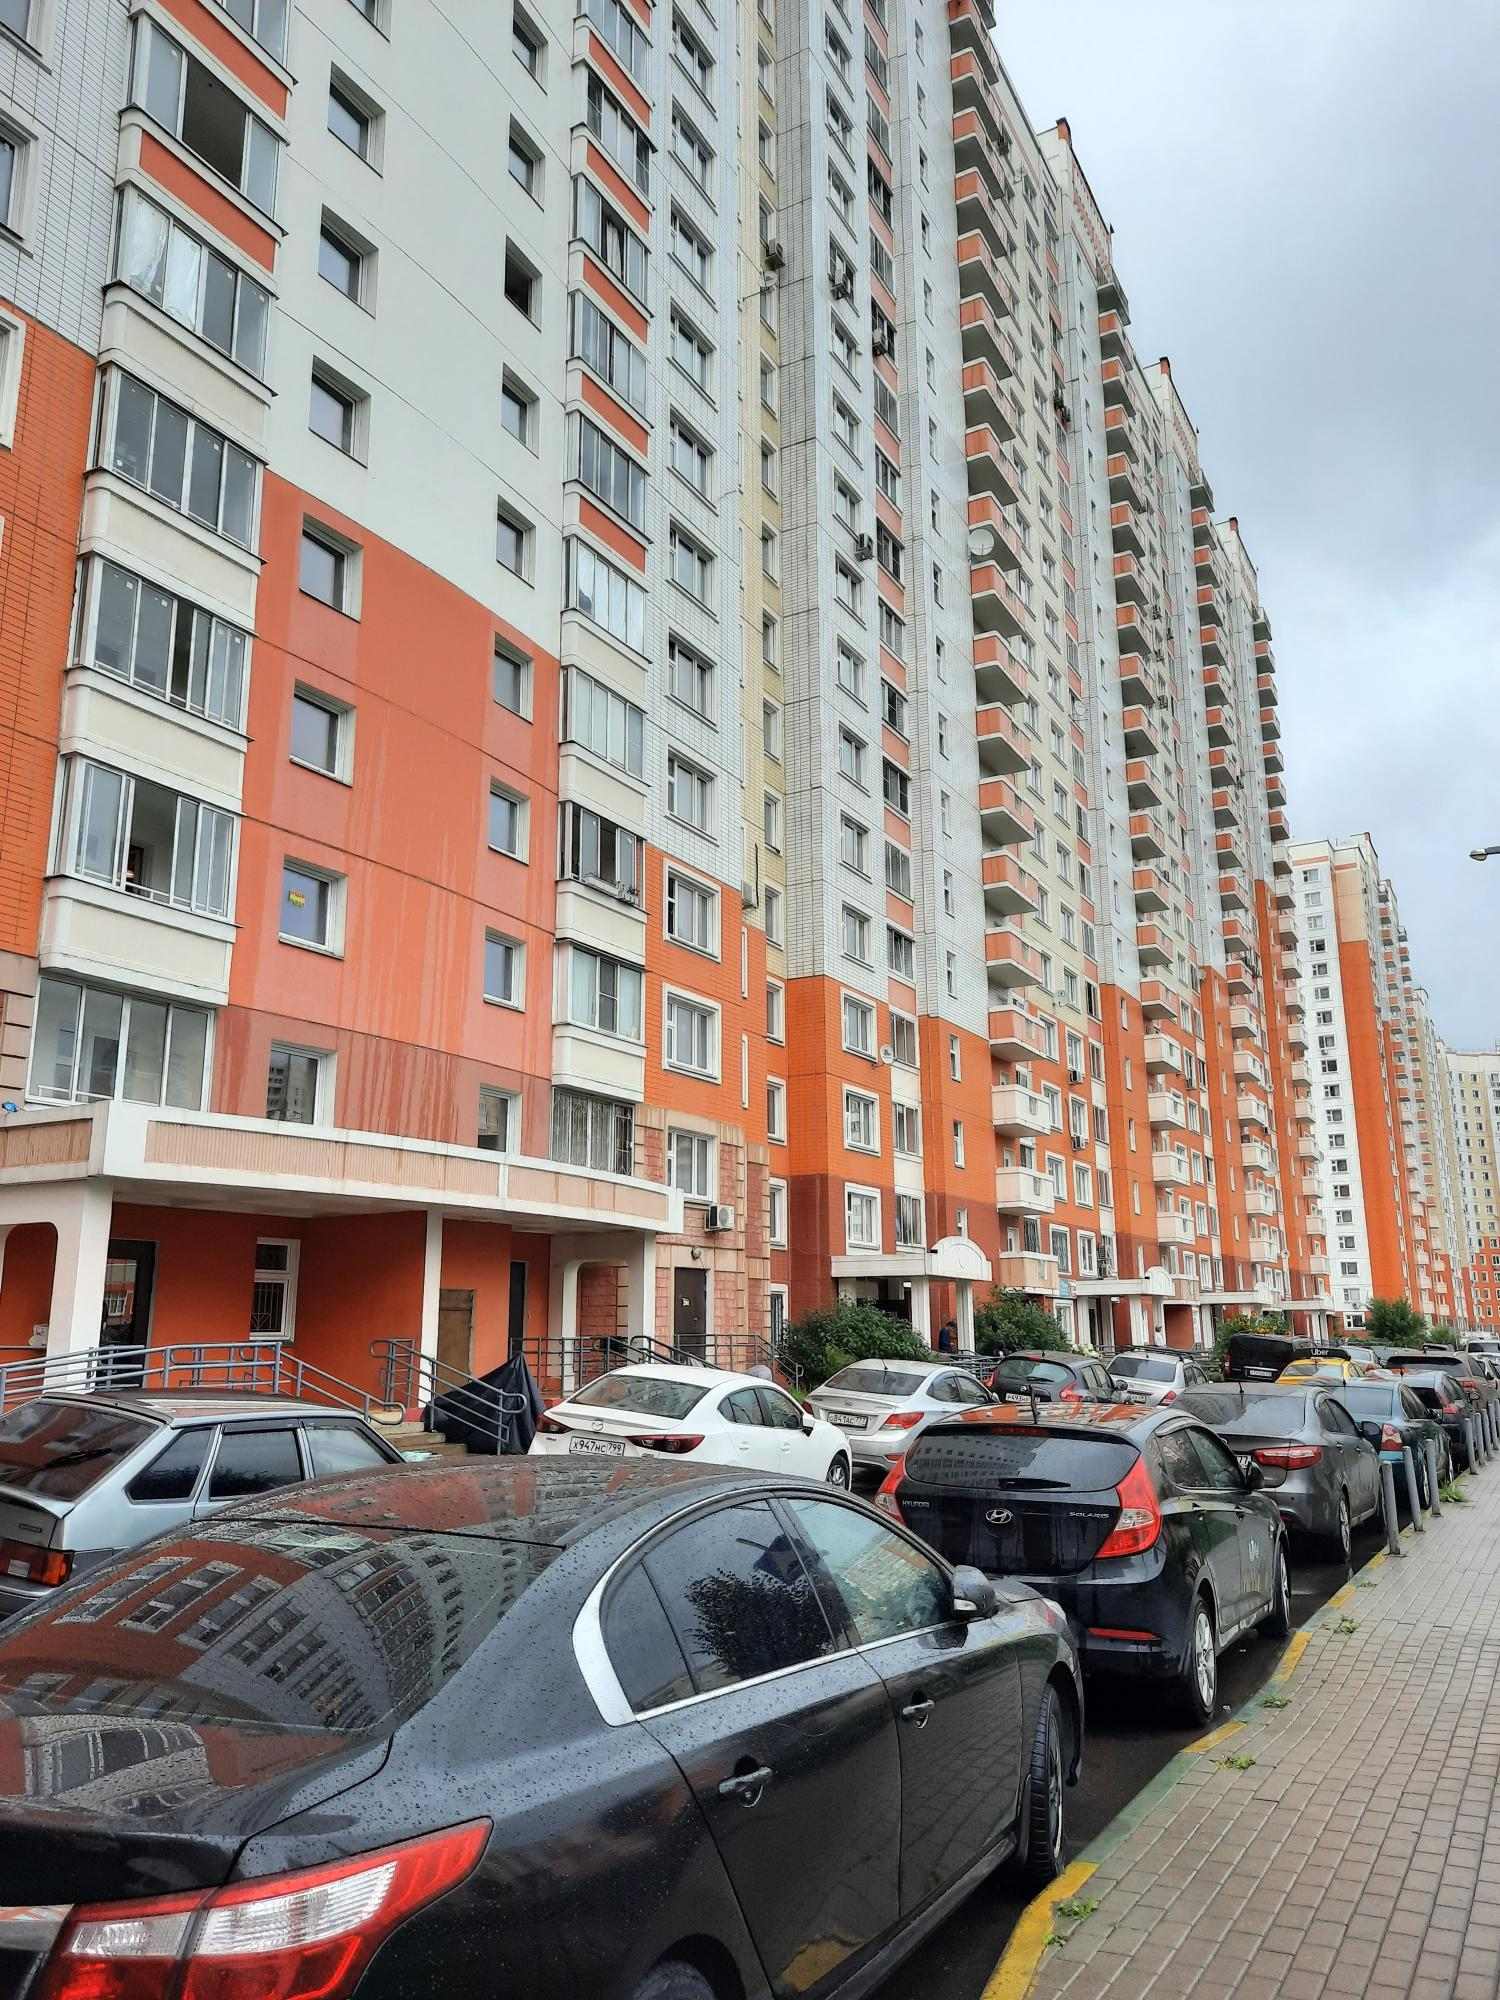 Квартира, 2 комнаты, 61 м² 89269689212 купить 9